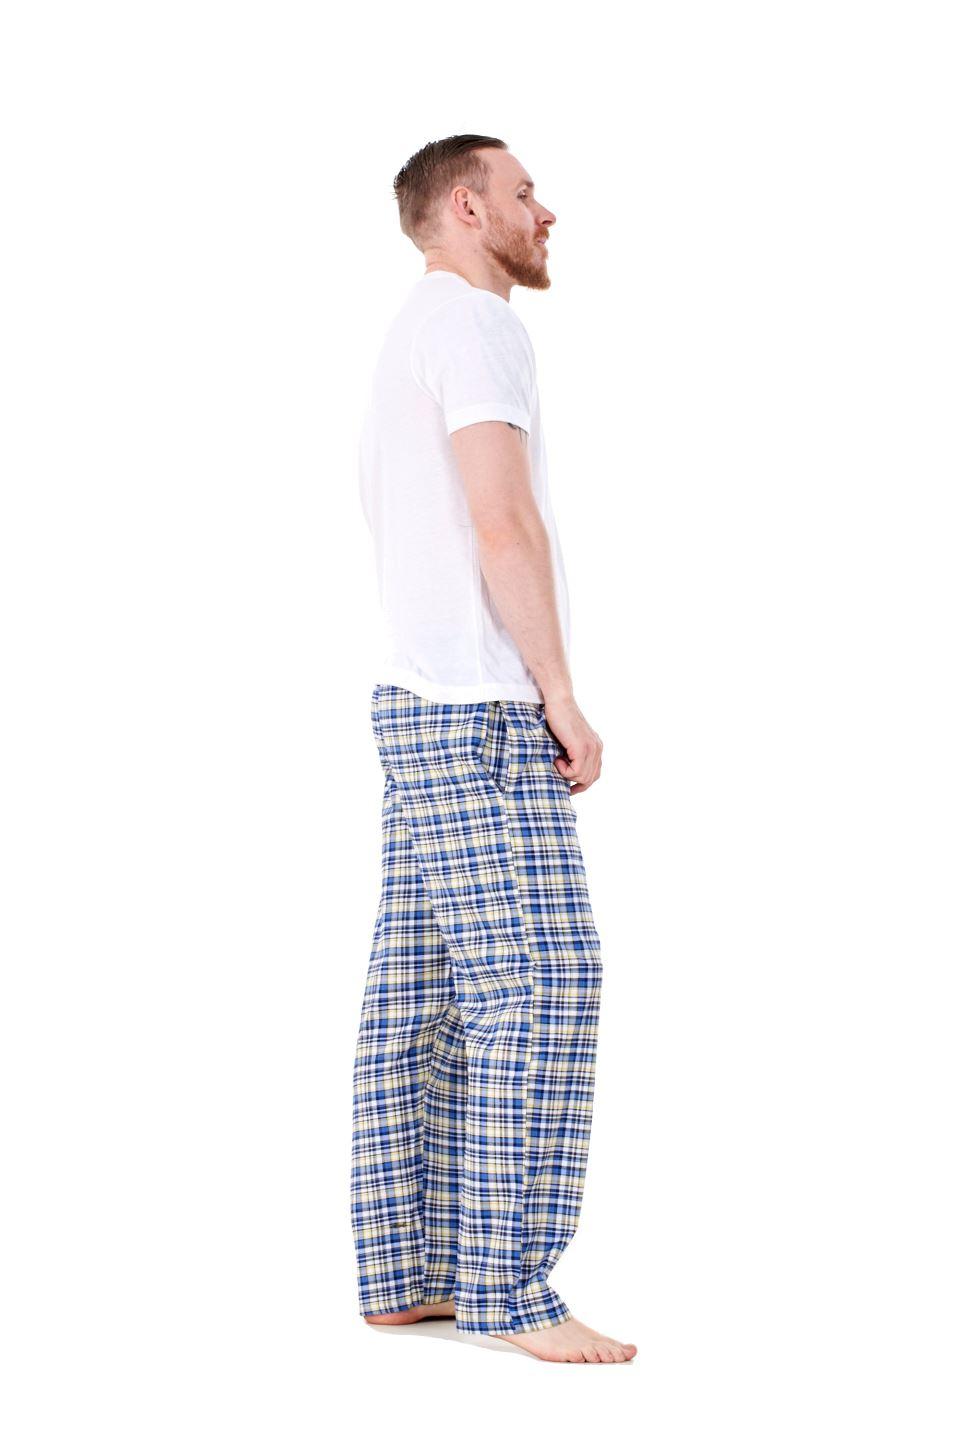 Mens-Pyjama-Bottoms-Rich-Cotton-Woven-Check-Lounge-Pant-Nightwear-Big-3XL-to-5XL Indexbild 20